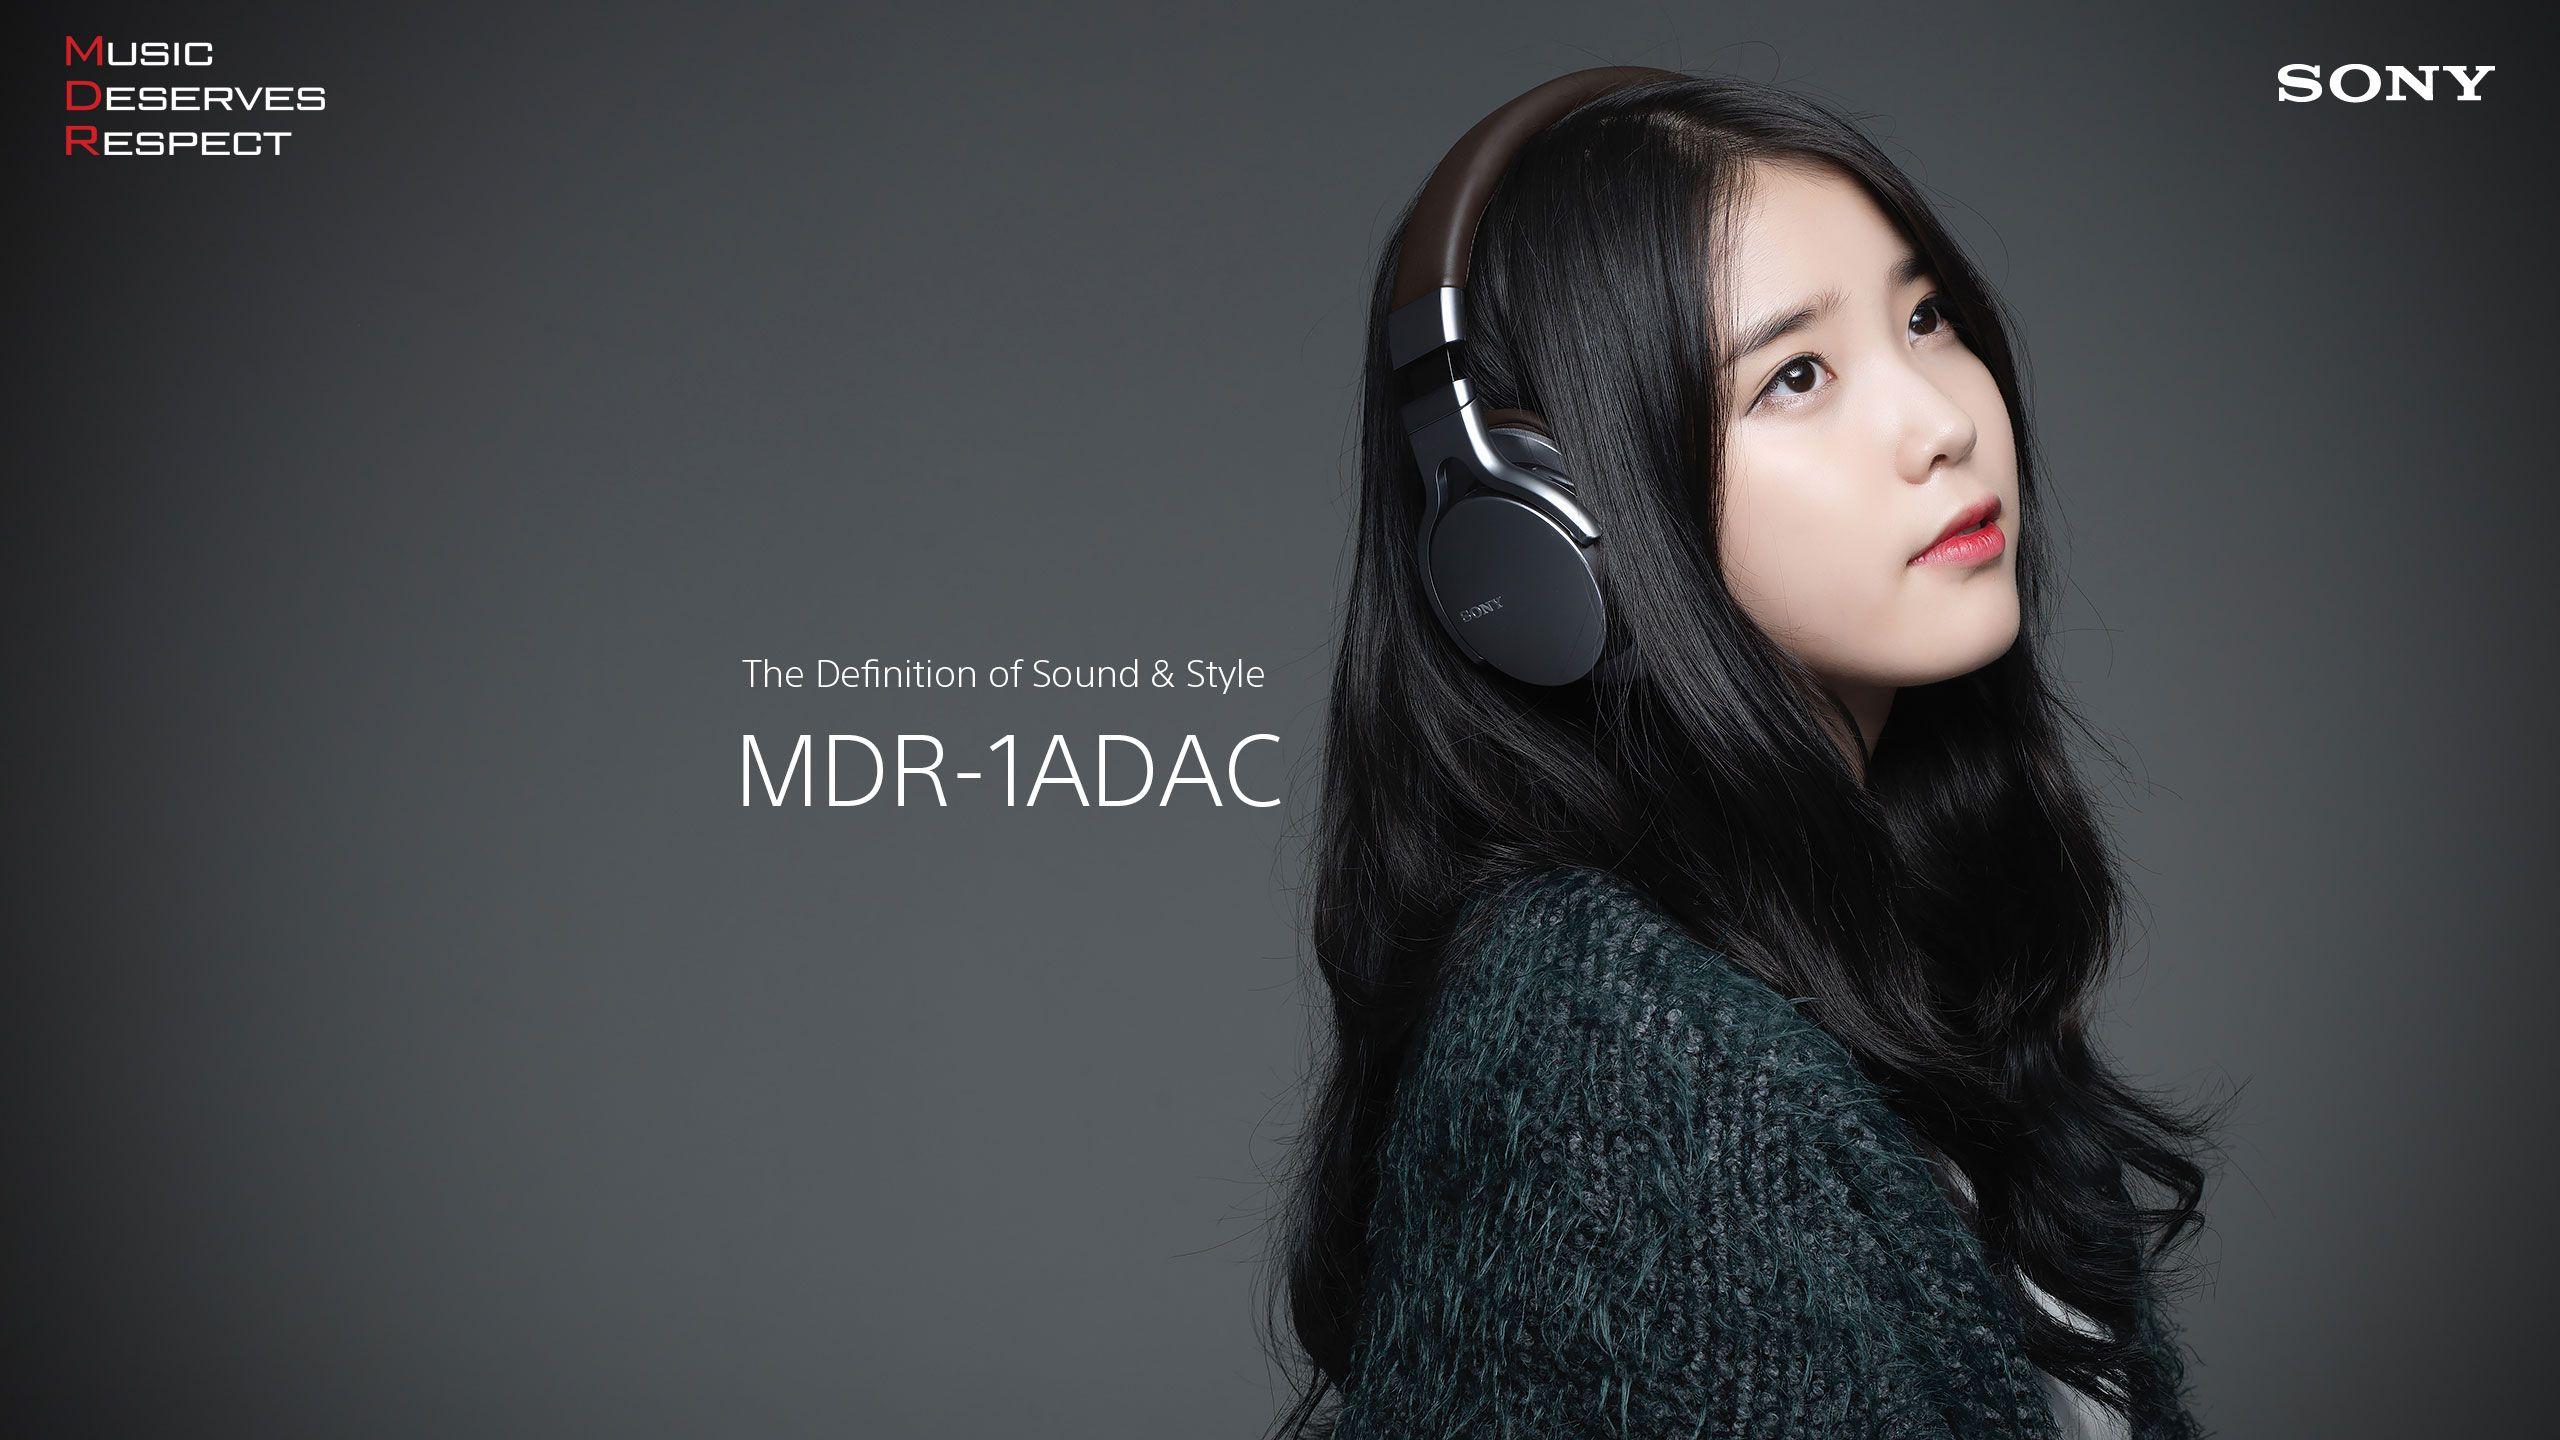 Kpop singer IU Sony headphone wallpaper